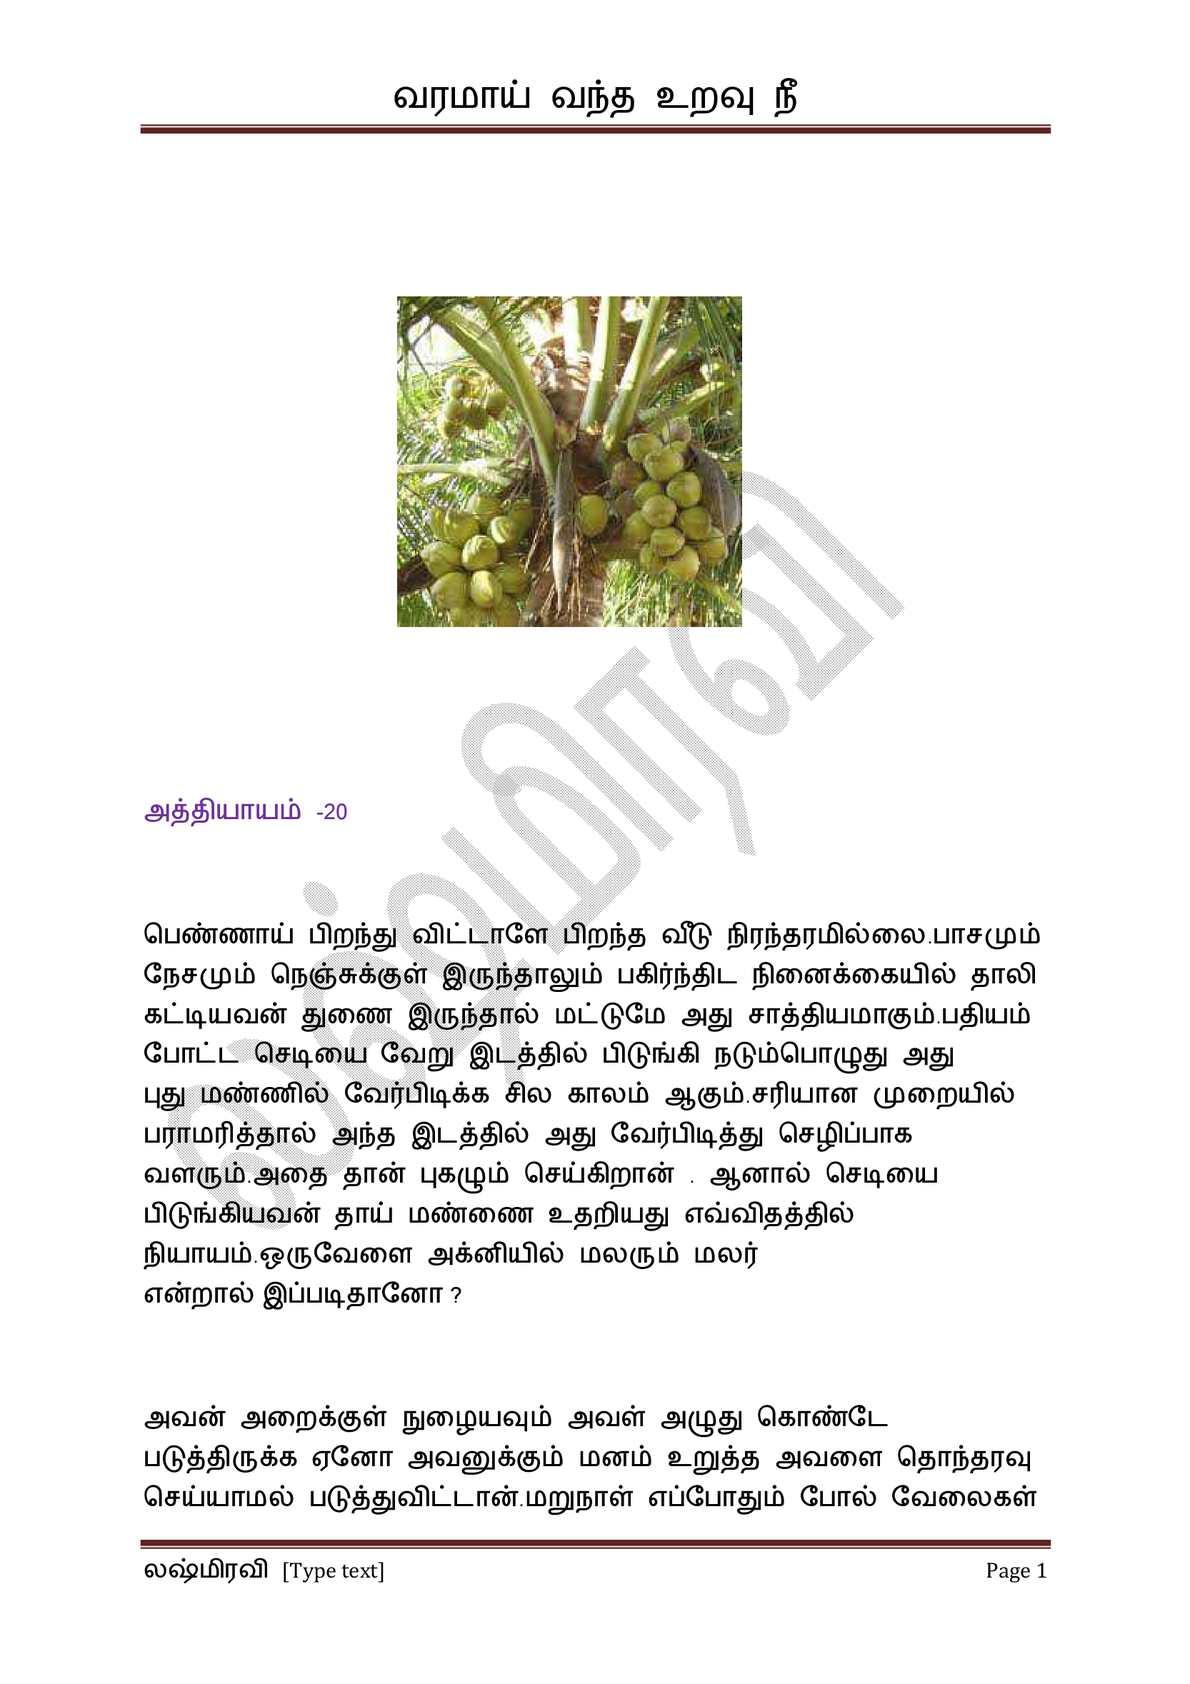 Varamaai Vantha Uravu Nee 20